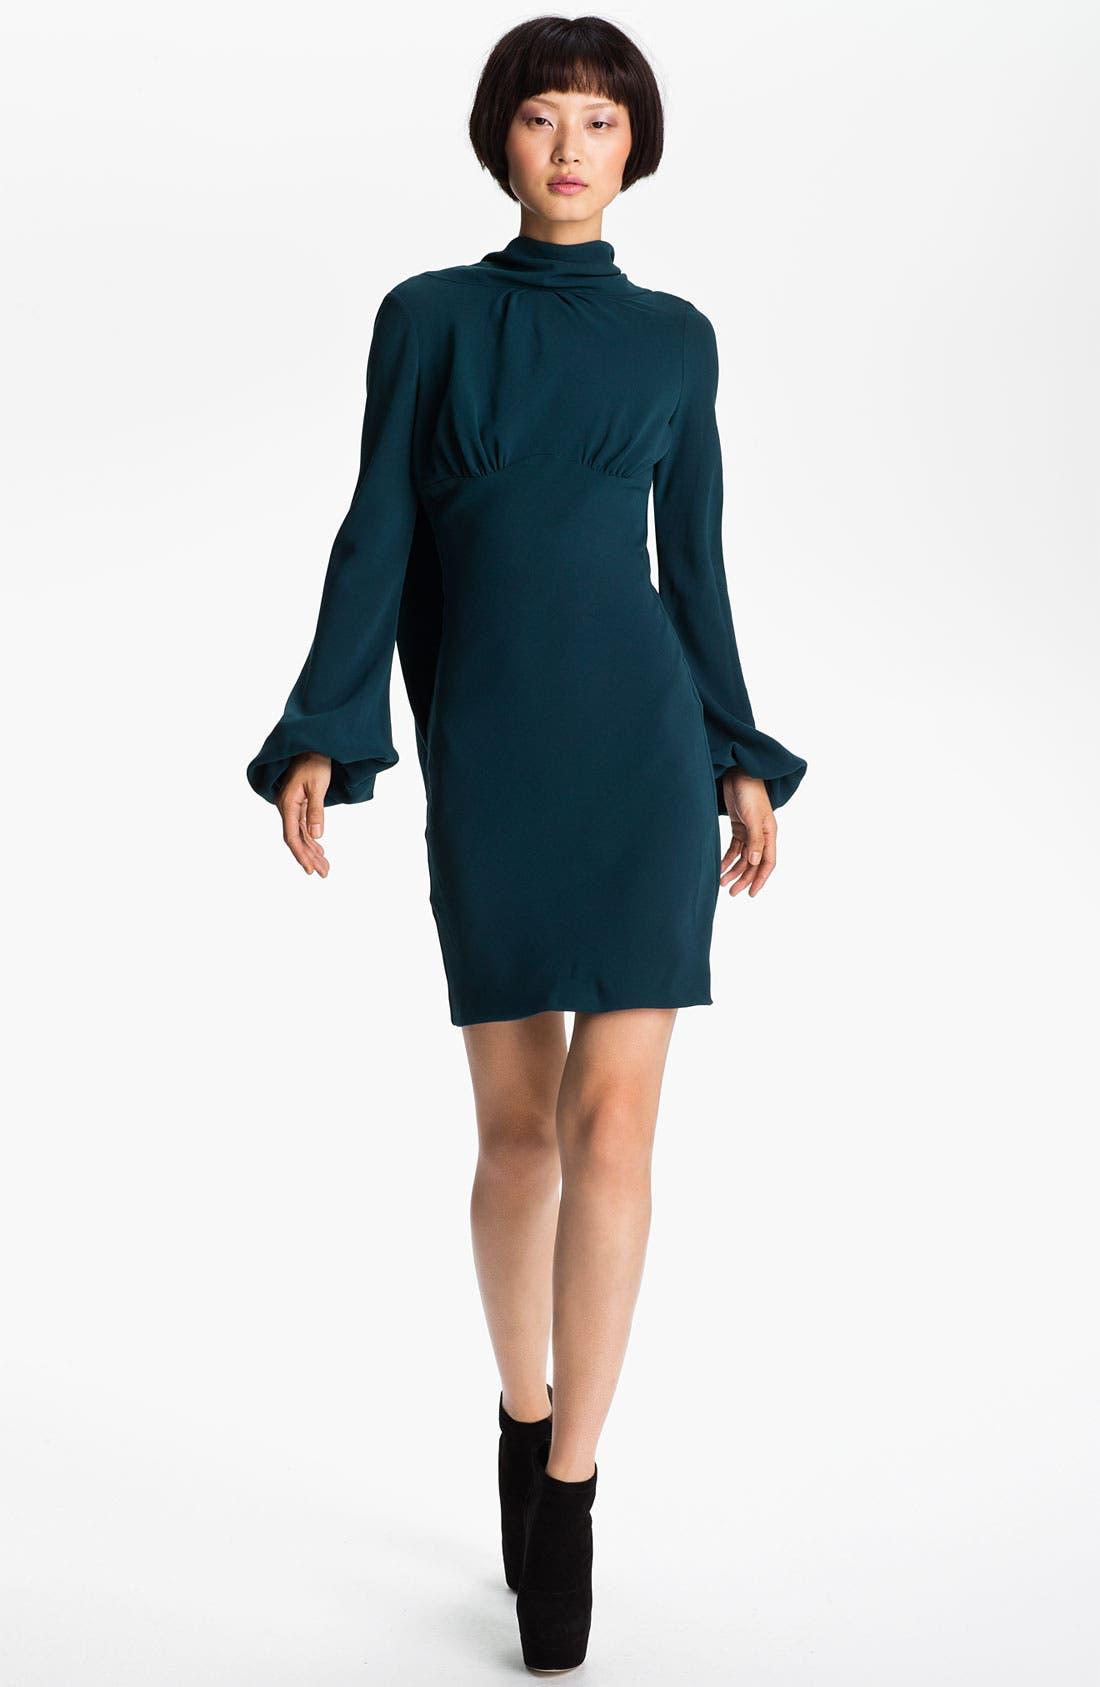 Main Image - Skaist-Taylor 'Laura' Drape Back Crepe Dress